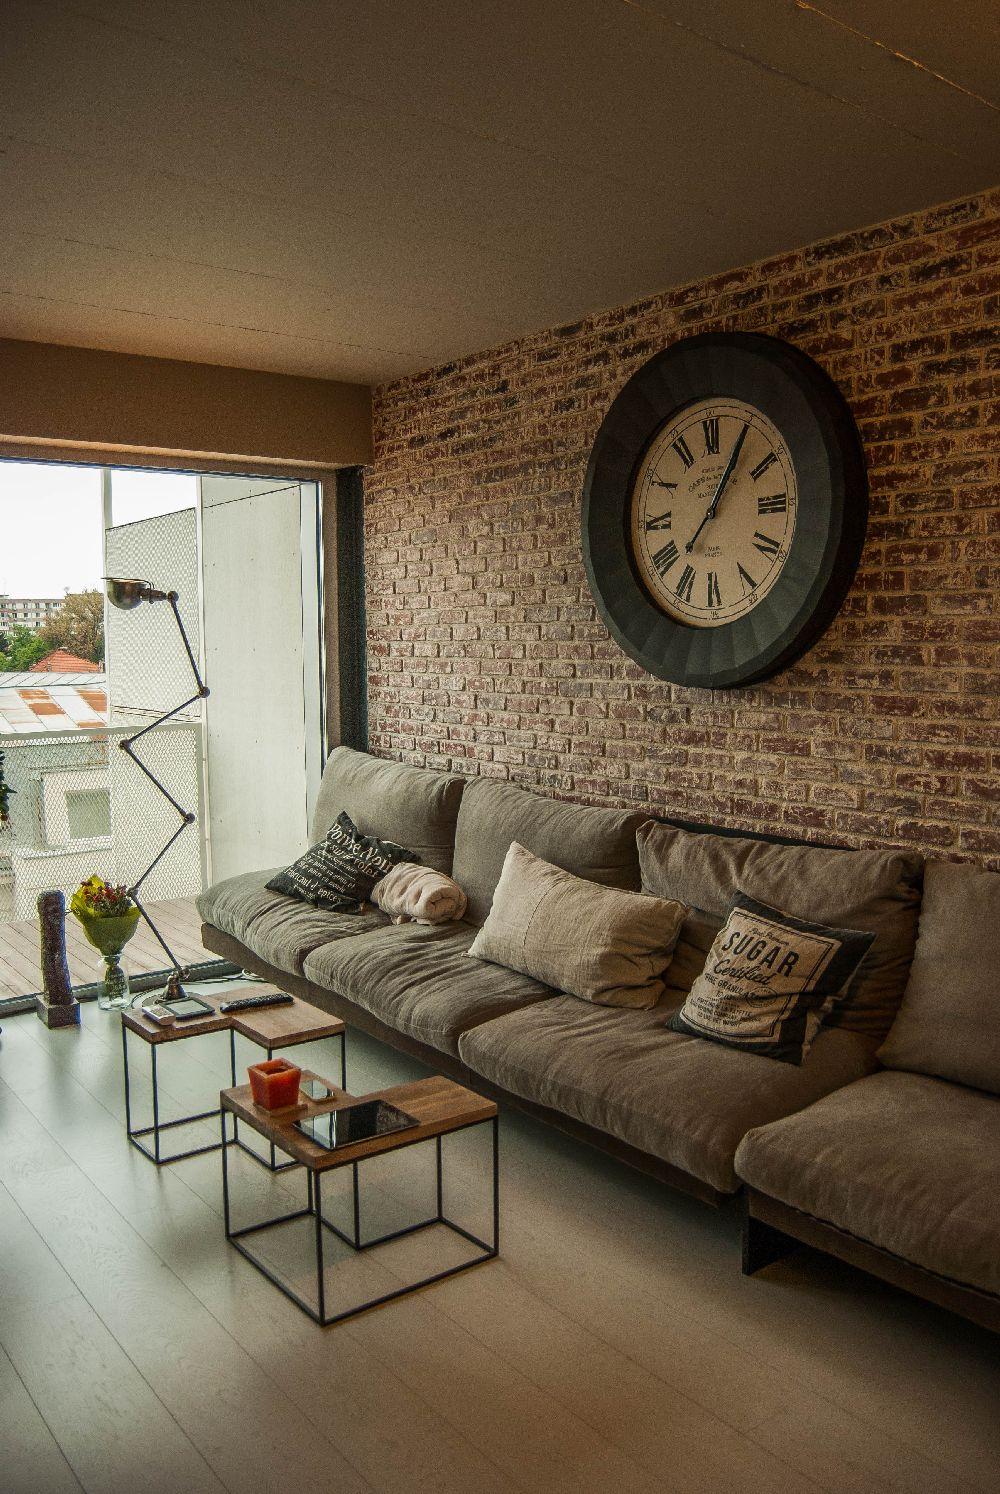 adelaparvu.com despre amenajare apartament cu lemn masiv, design interior arh Ciprian Manda, Foto Aliona Danielescu, Niculae Stoleriu (10)